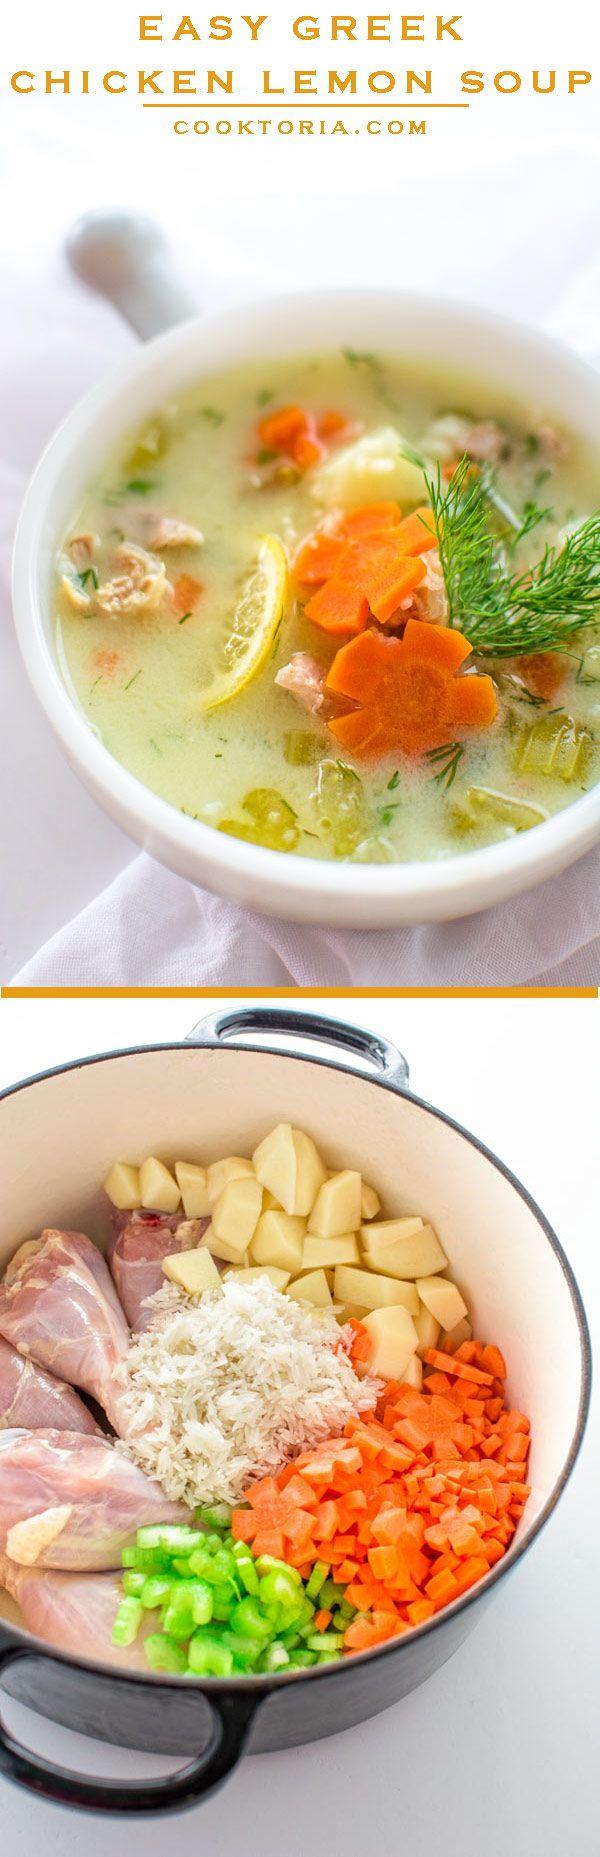 Easy Greek Chicken Lemon Soup. Dill + Lemon = Delicious